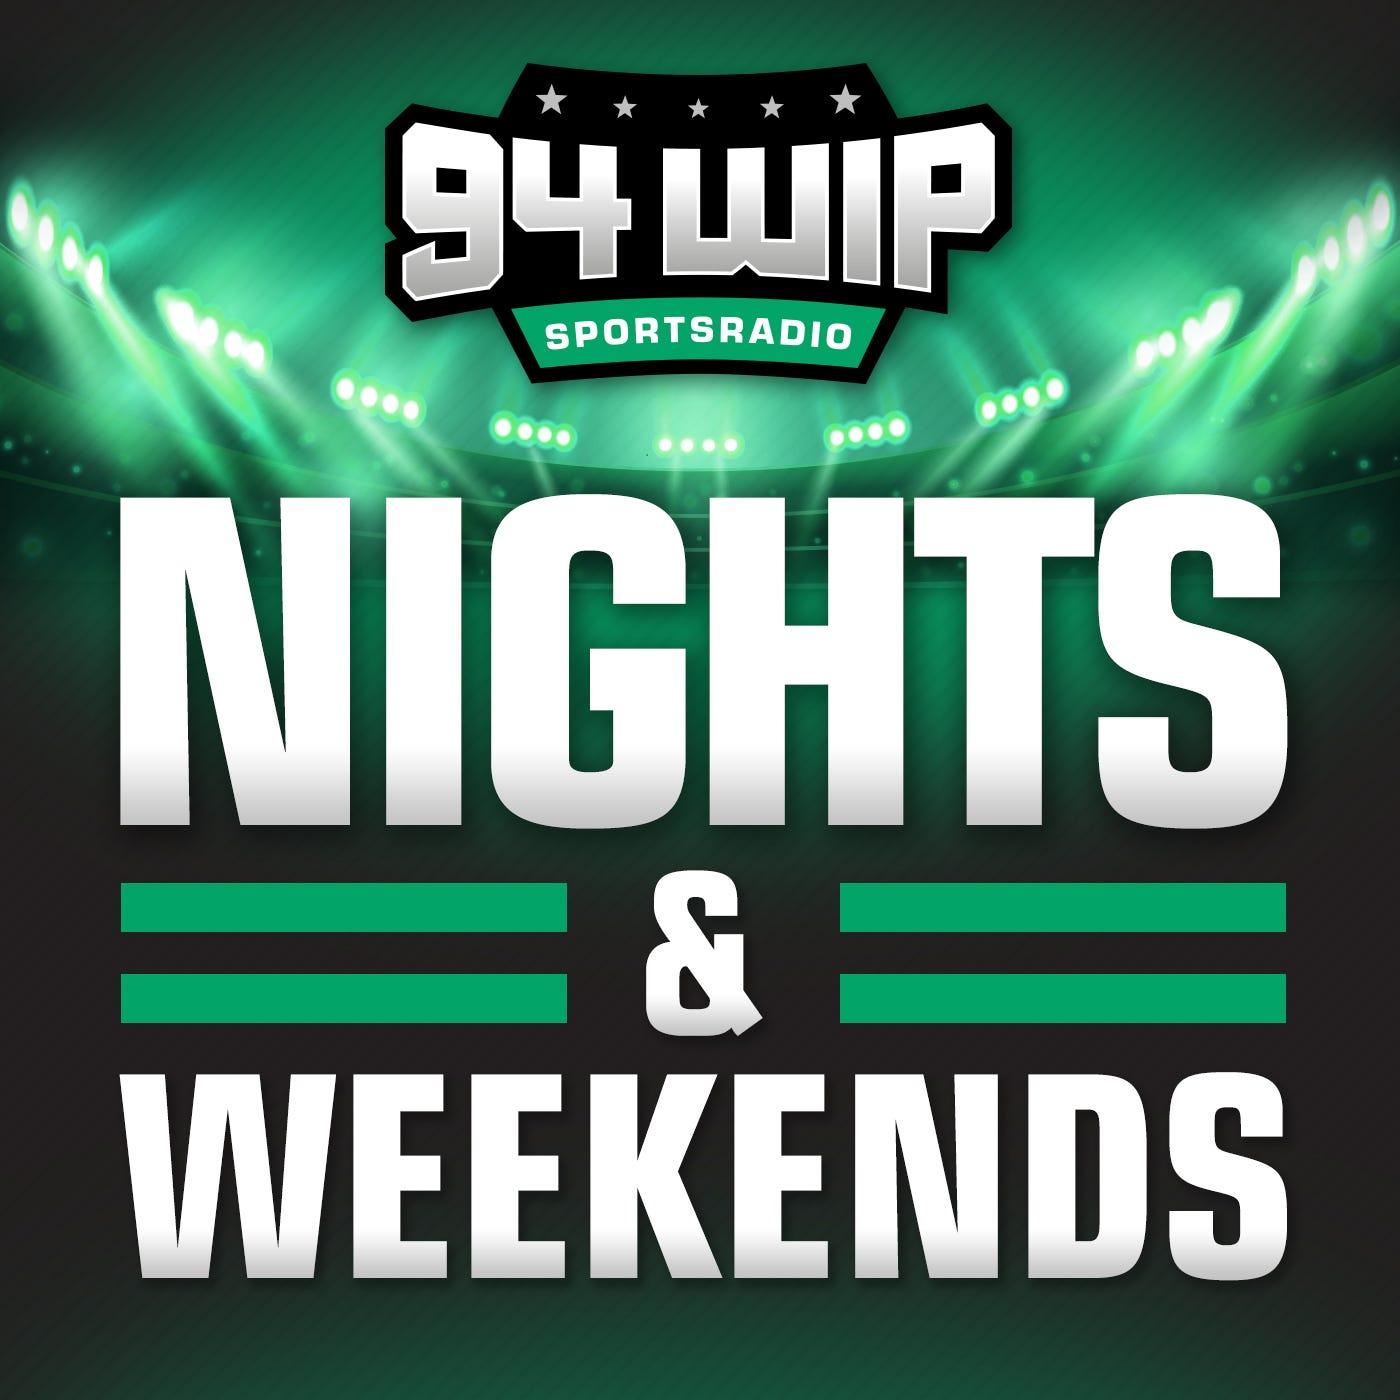 SportsRadio 94WIP on Radio com: Listen to Free Radio Online